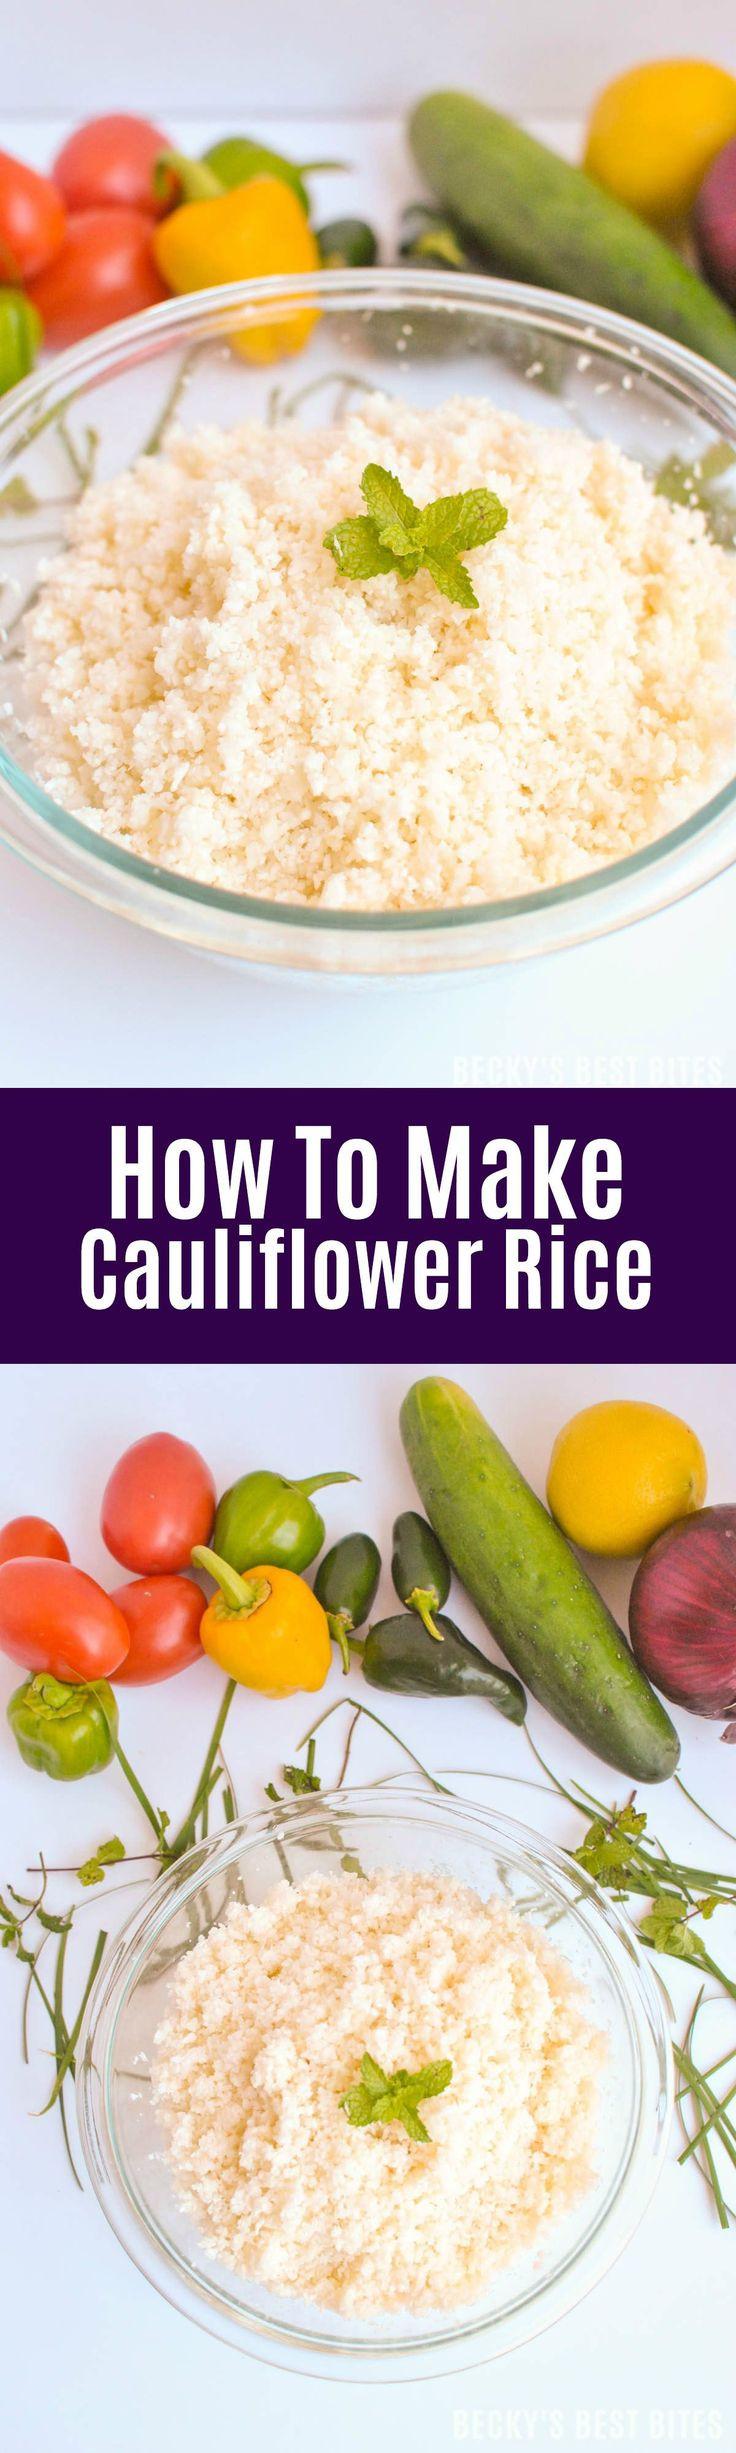 Low Carb High Fiber Recipes  25 best ideas about Fiber t on Pinterest